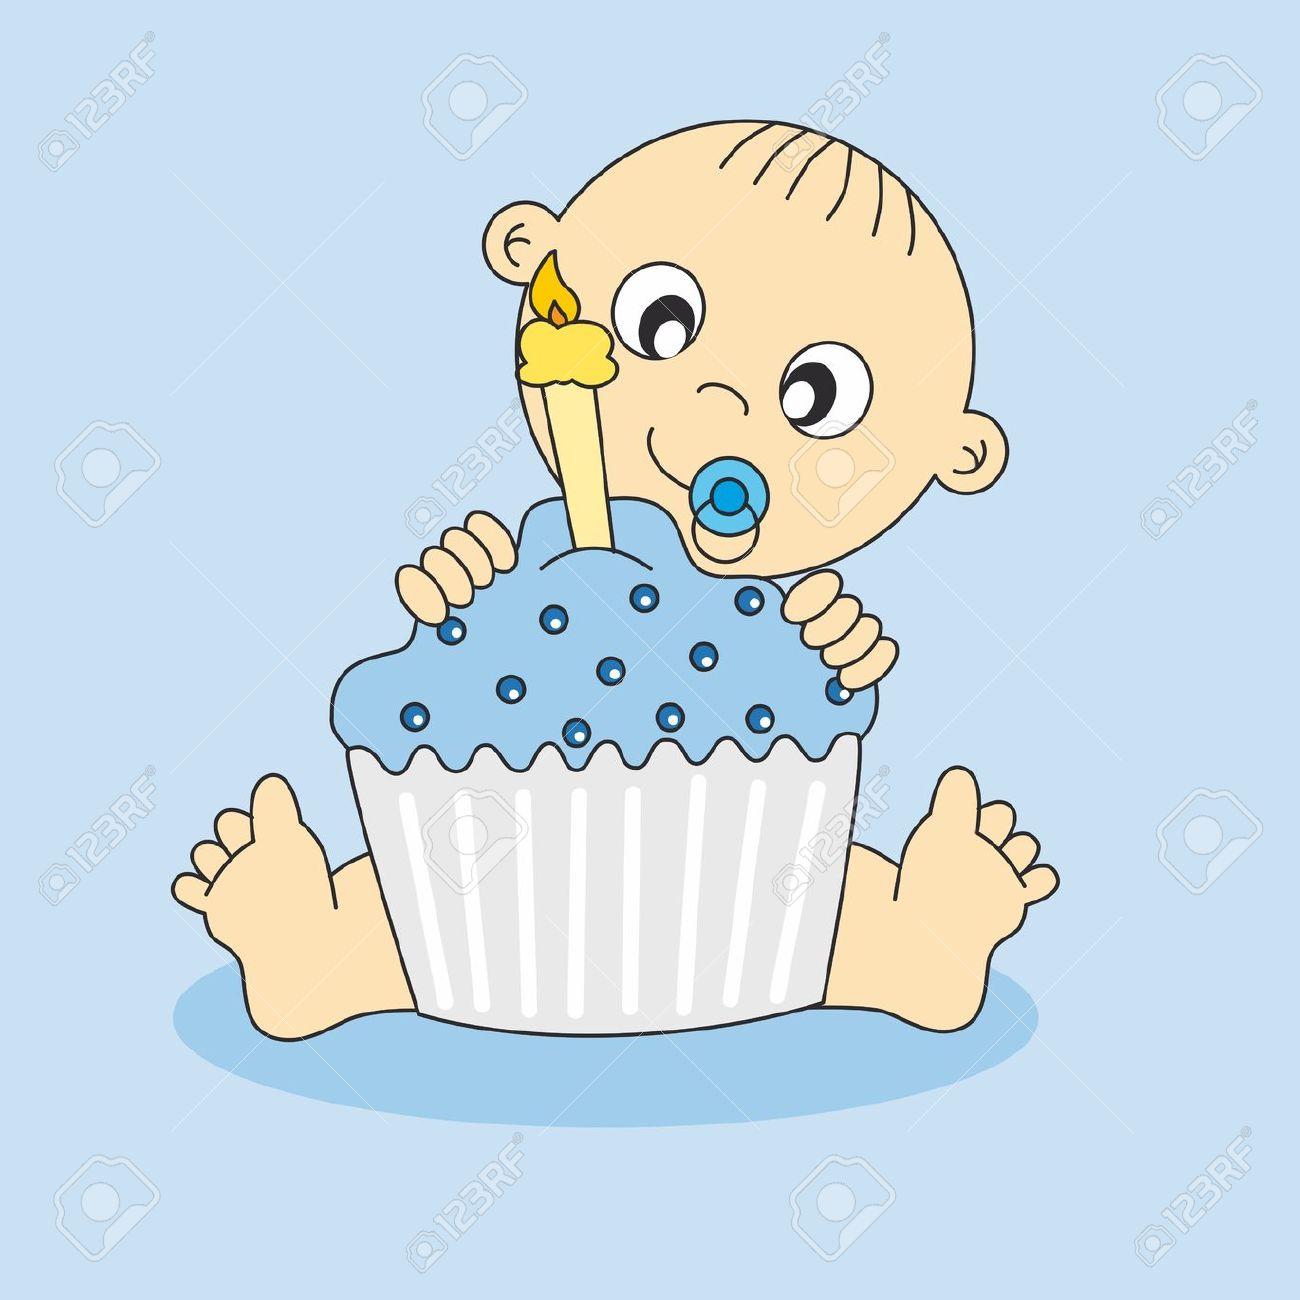 Baby boy 1st birthday clipart clip art royalty free Baby boy 1st birthday clipart - ClipartFest clip art royalty free